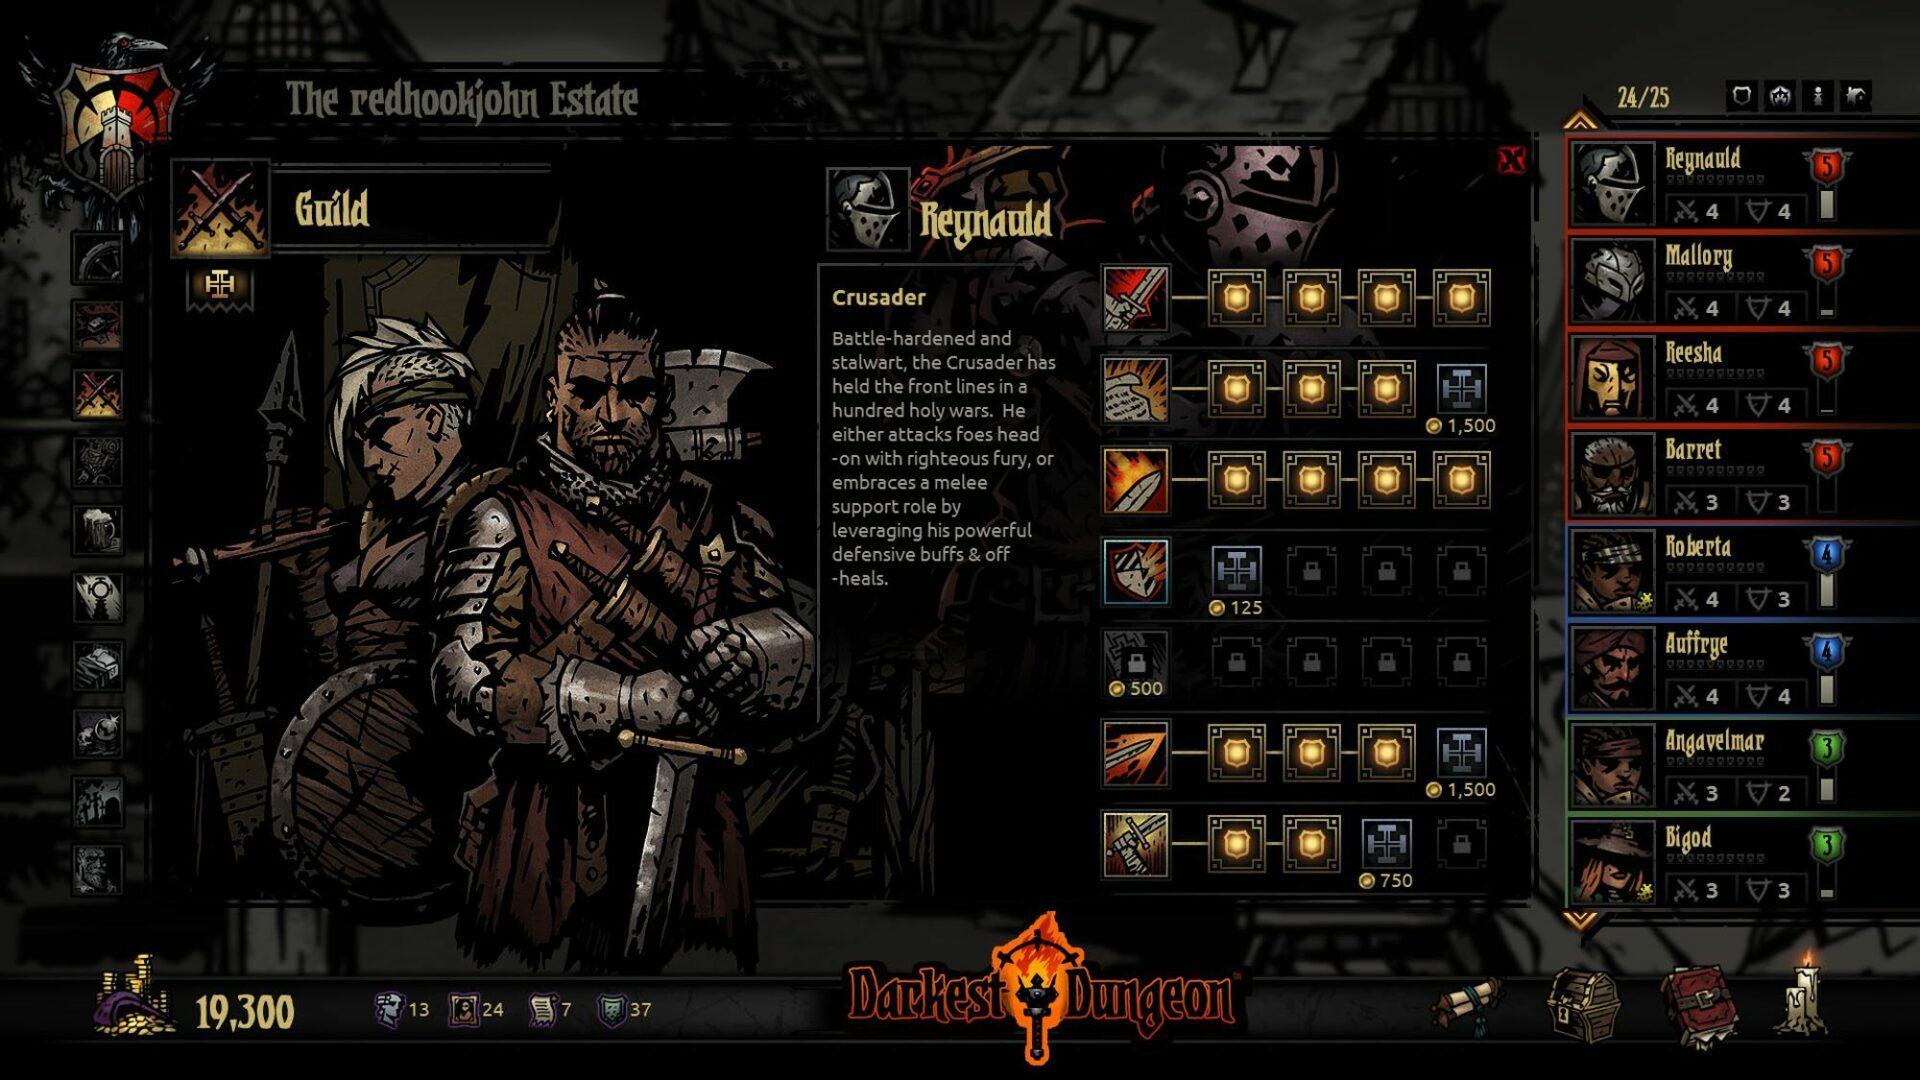 DarkestDungeonScreenShot1